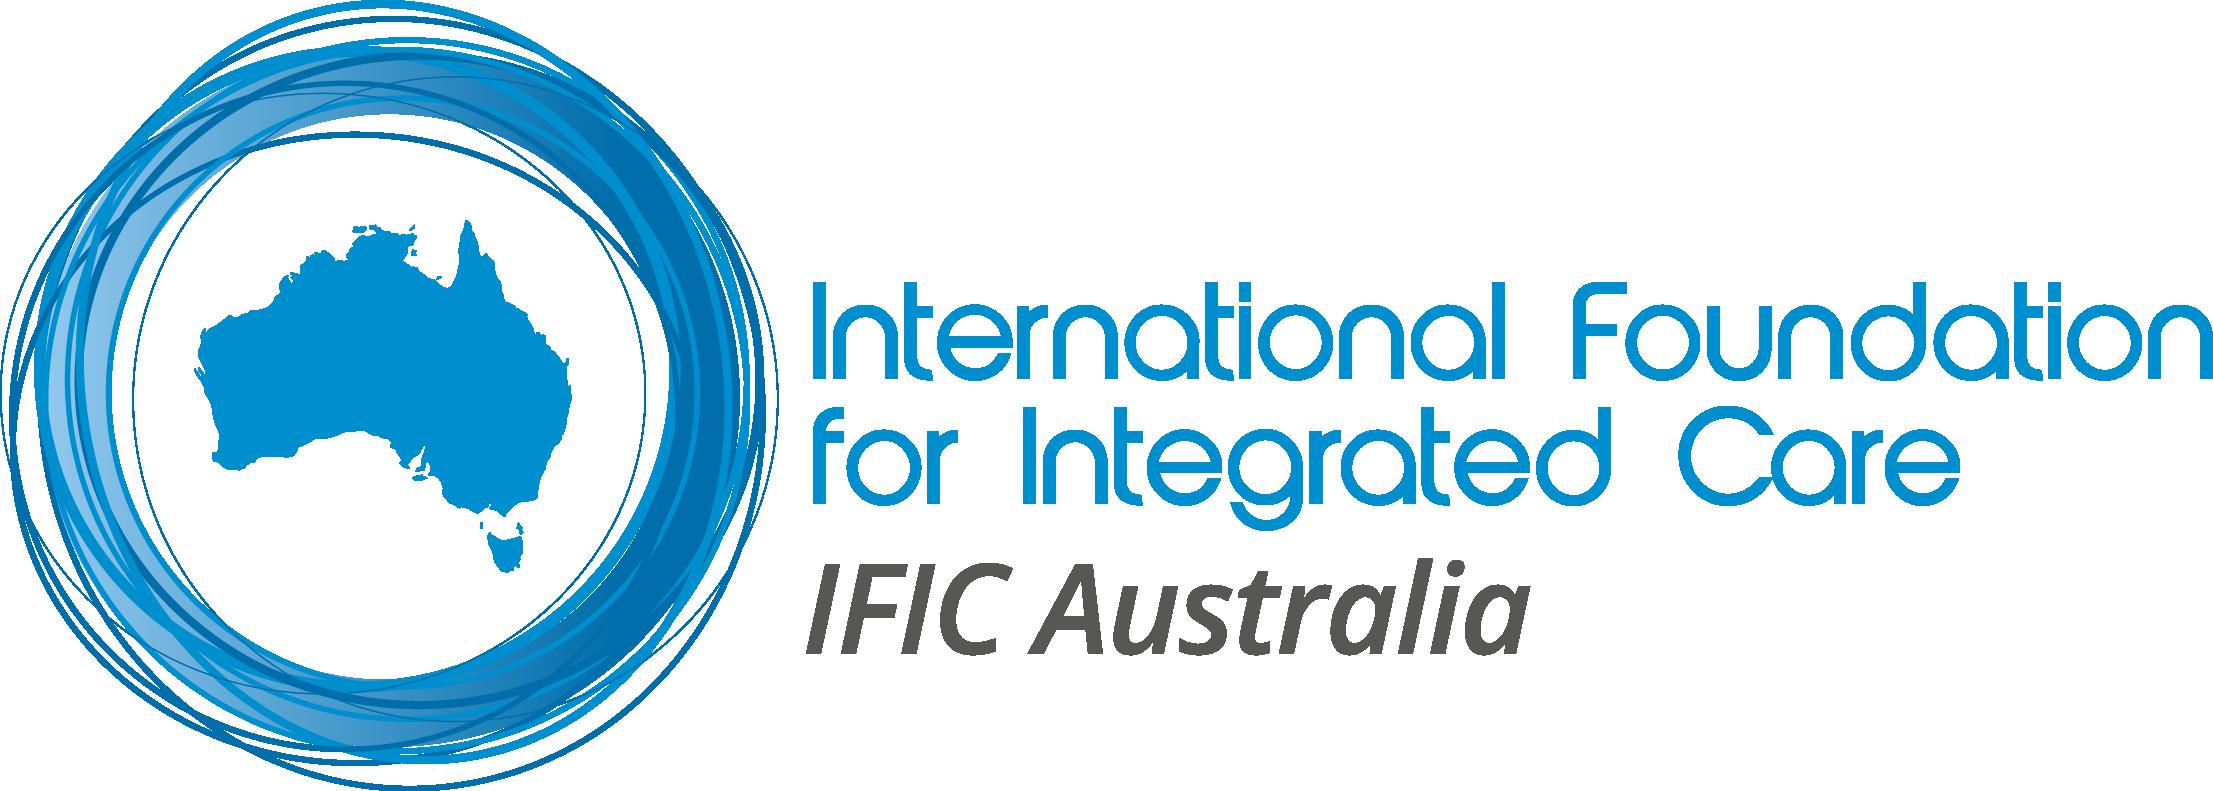 Australia 2018 global humanitarian programme design research